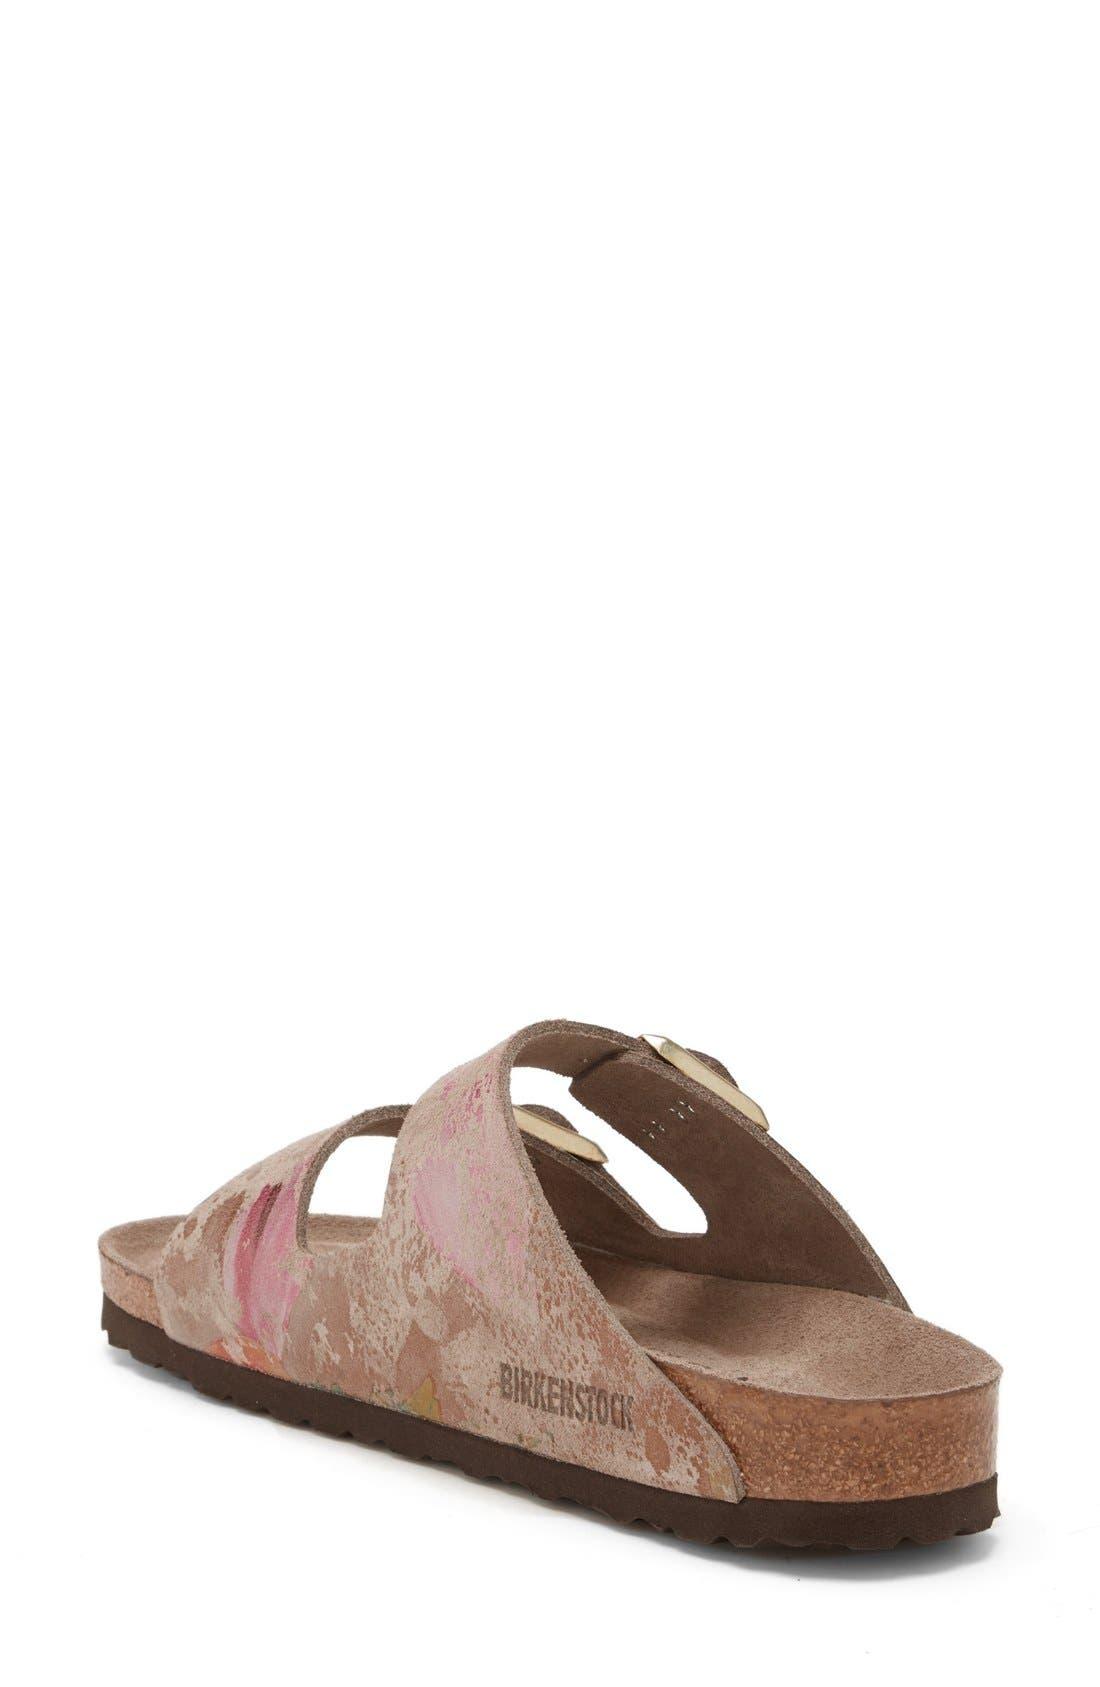 Alternate Image 2  - Birkenstock 'Arizona' Soft Footbed Printed Leather Sandal (Women)